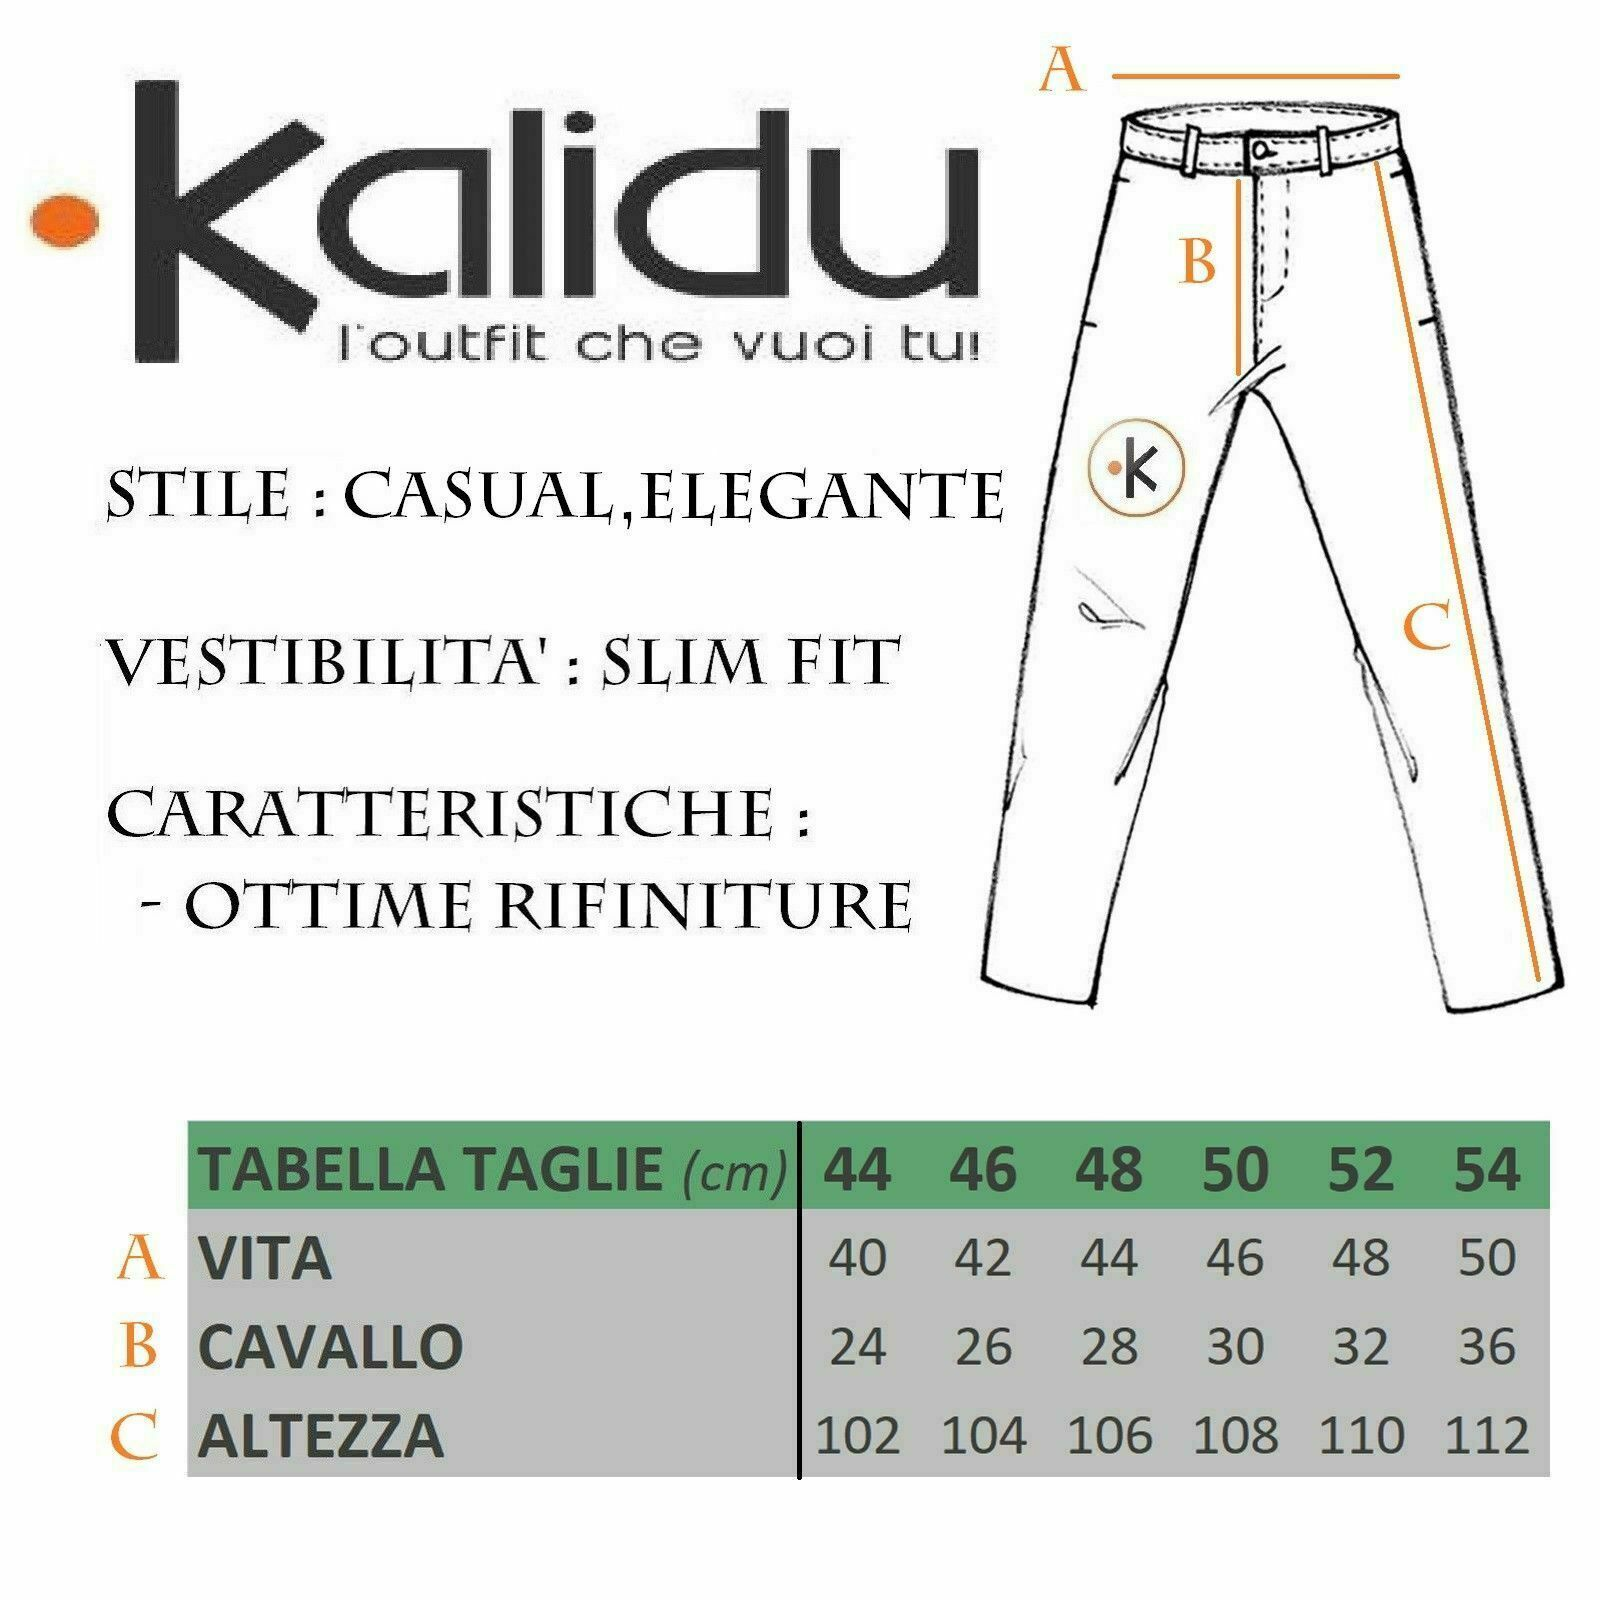 Pantalone-Uomo-Chino-Primaverile-slim-fit-Pantaloni-Eleganti-Blu-Verde-Nero miniatura 17